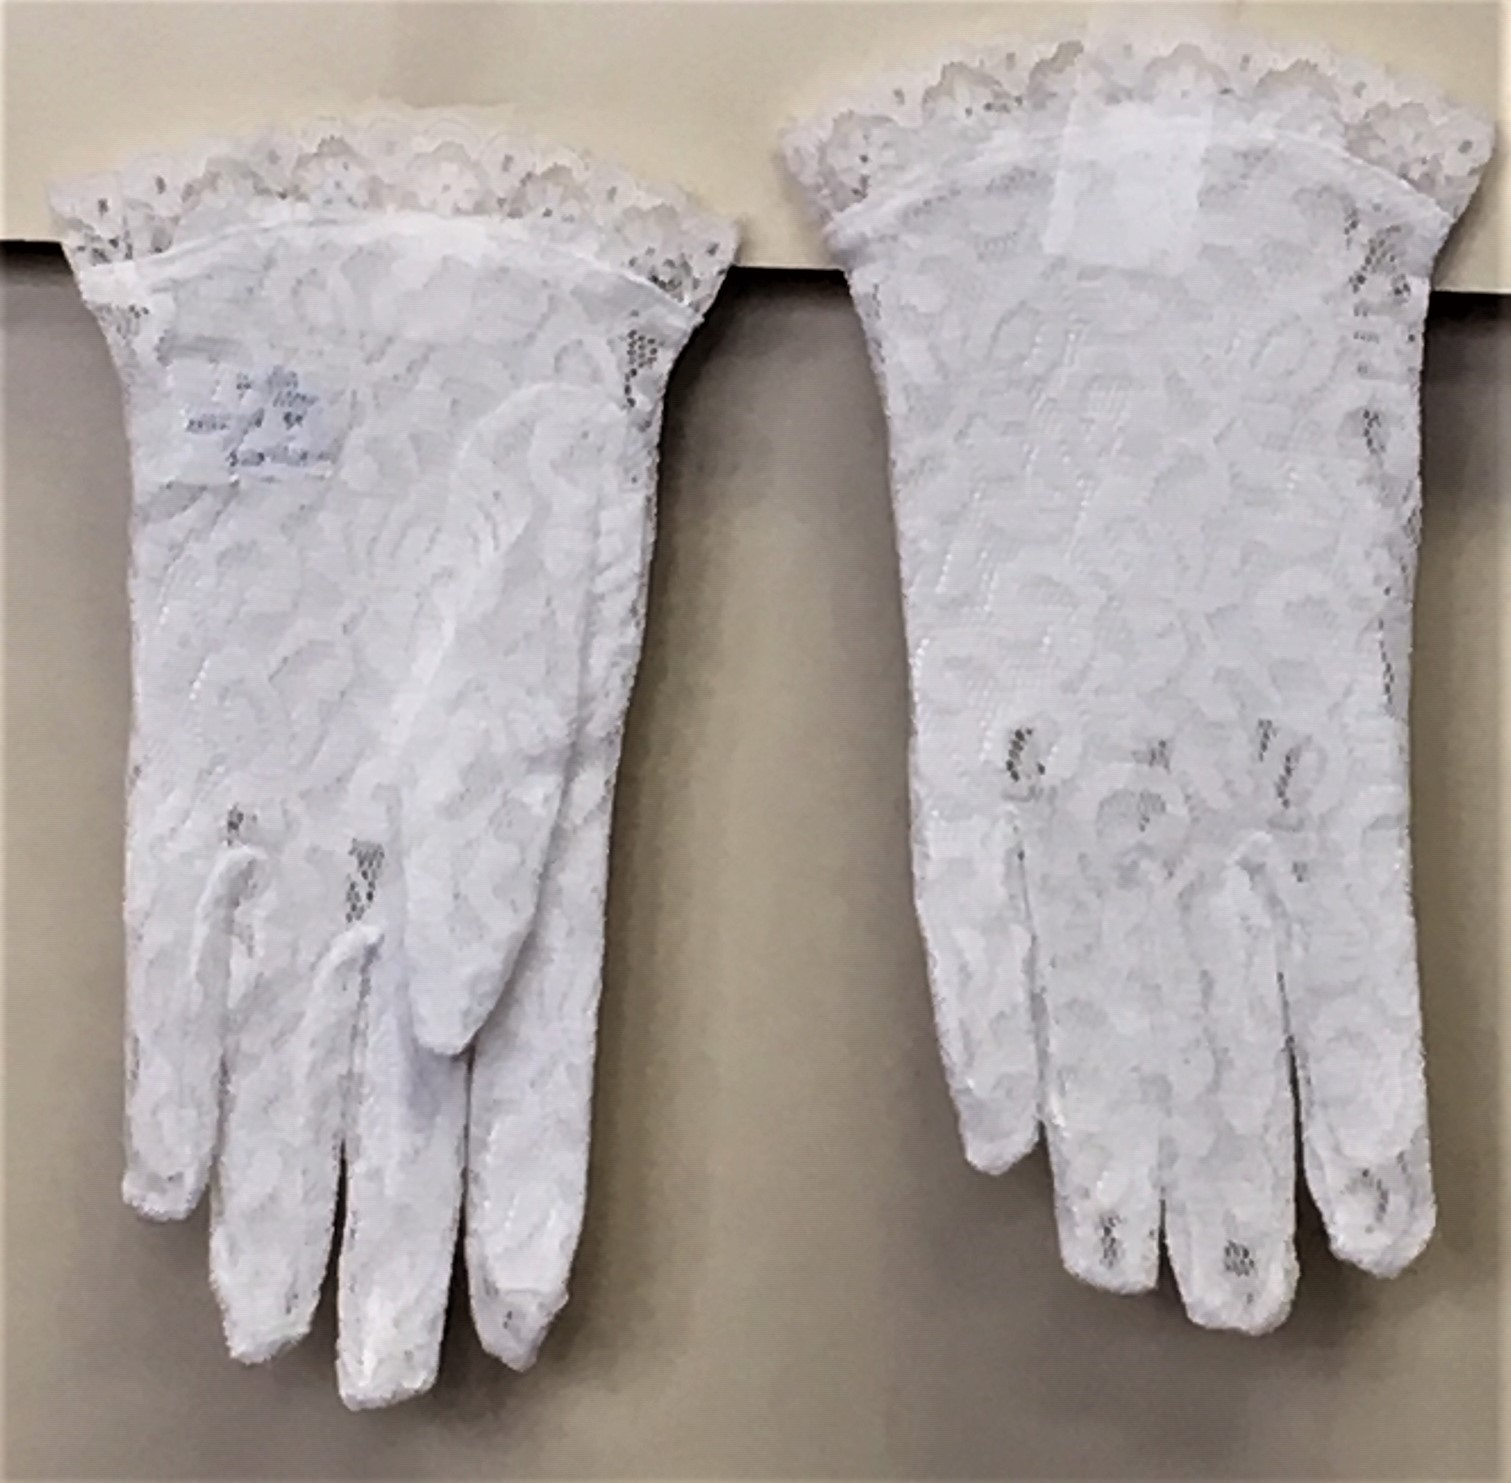 Barry's Children's Lace Glove